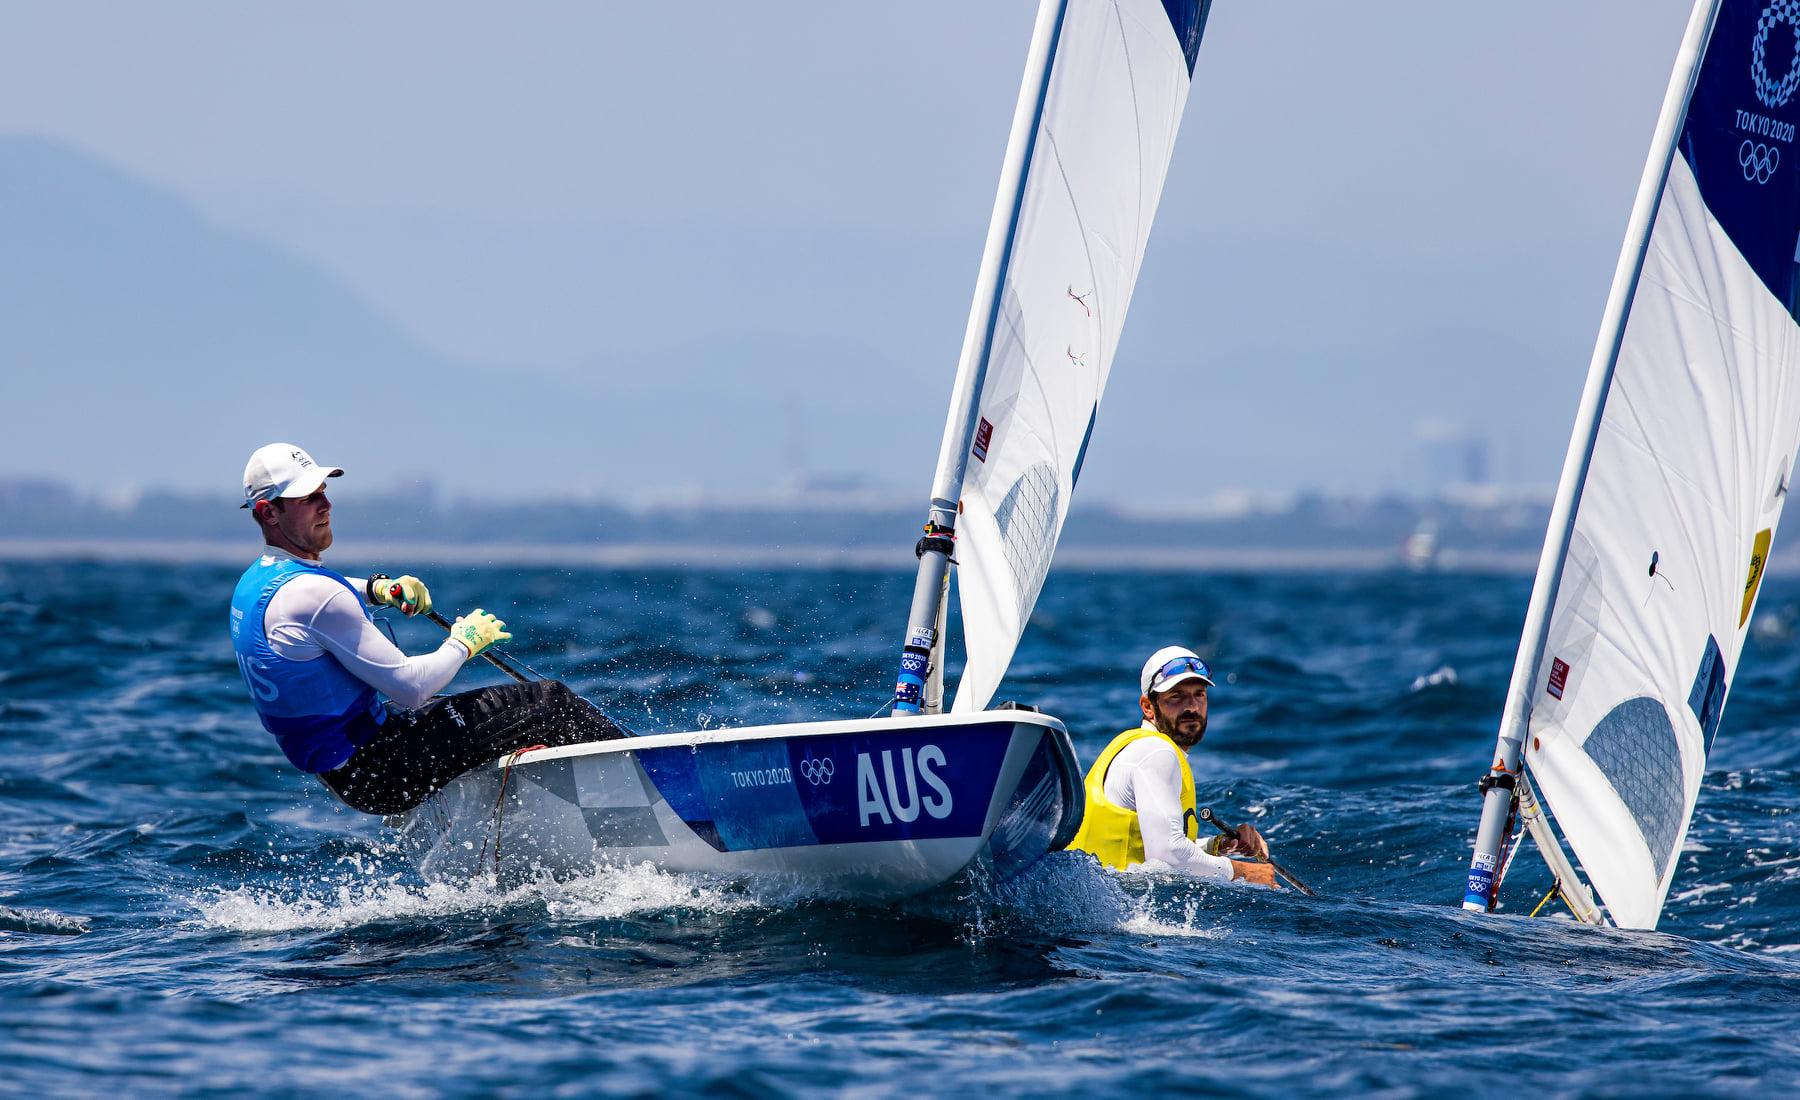 Matt Wearn sailing upwind